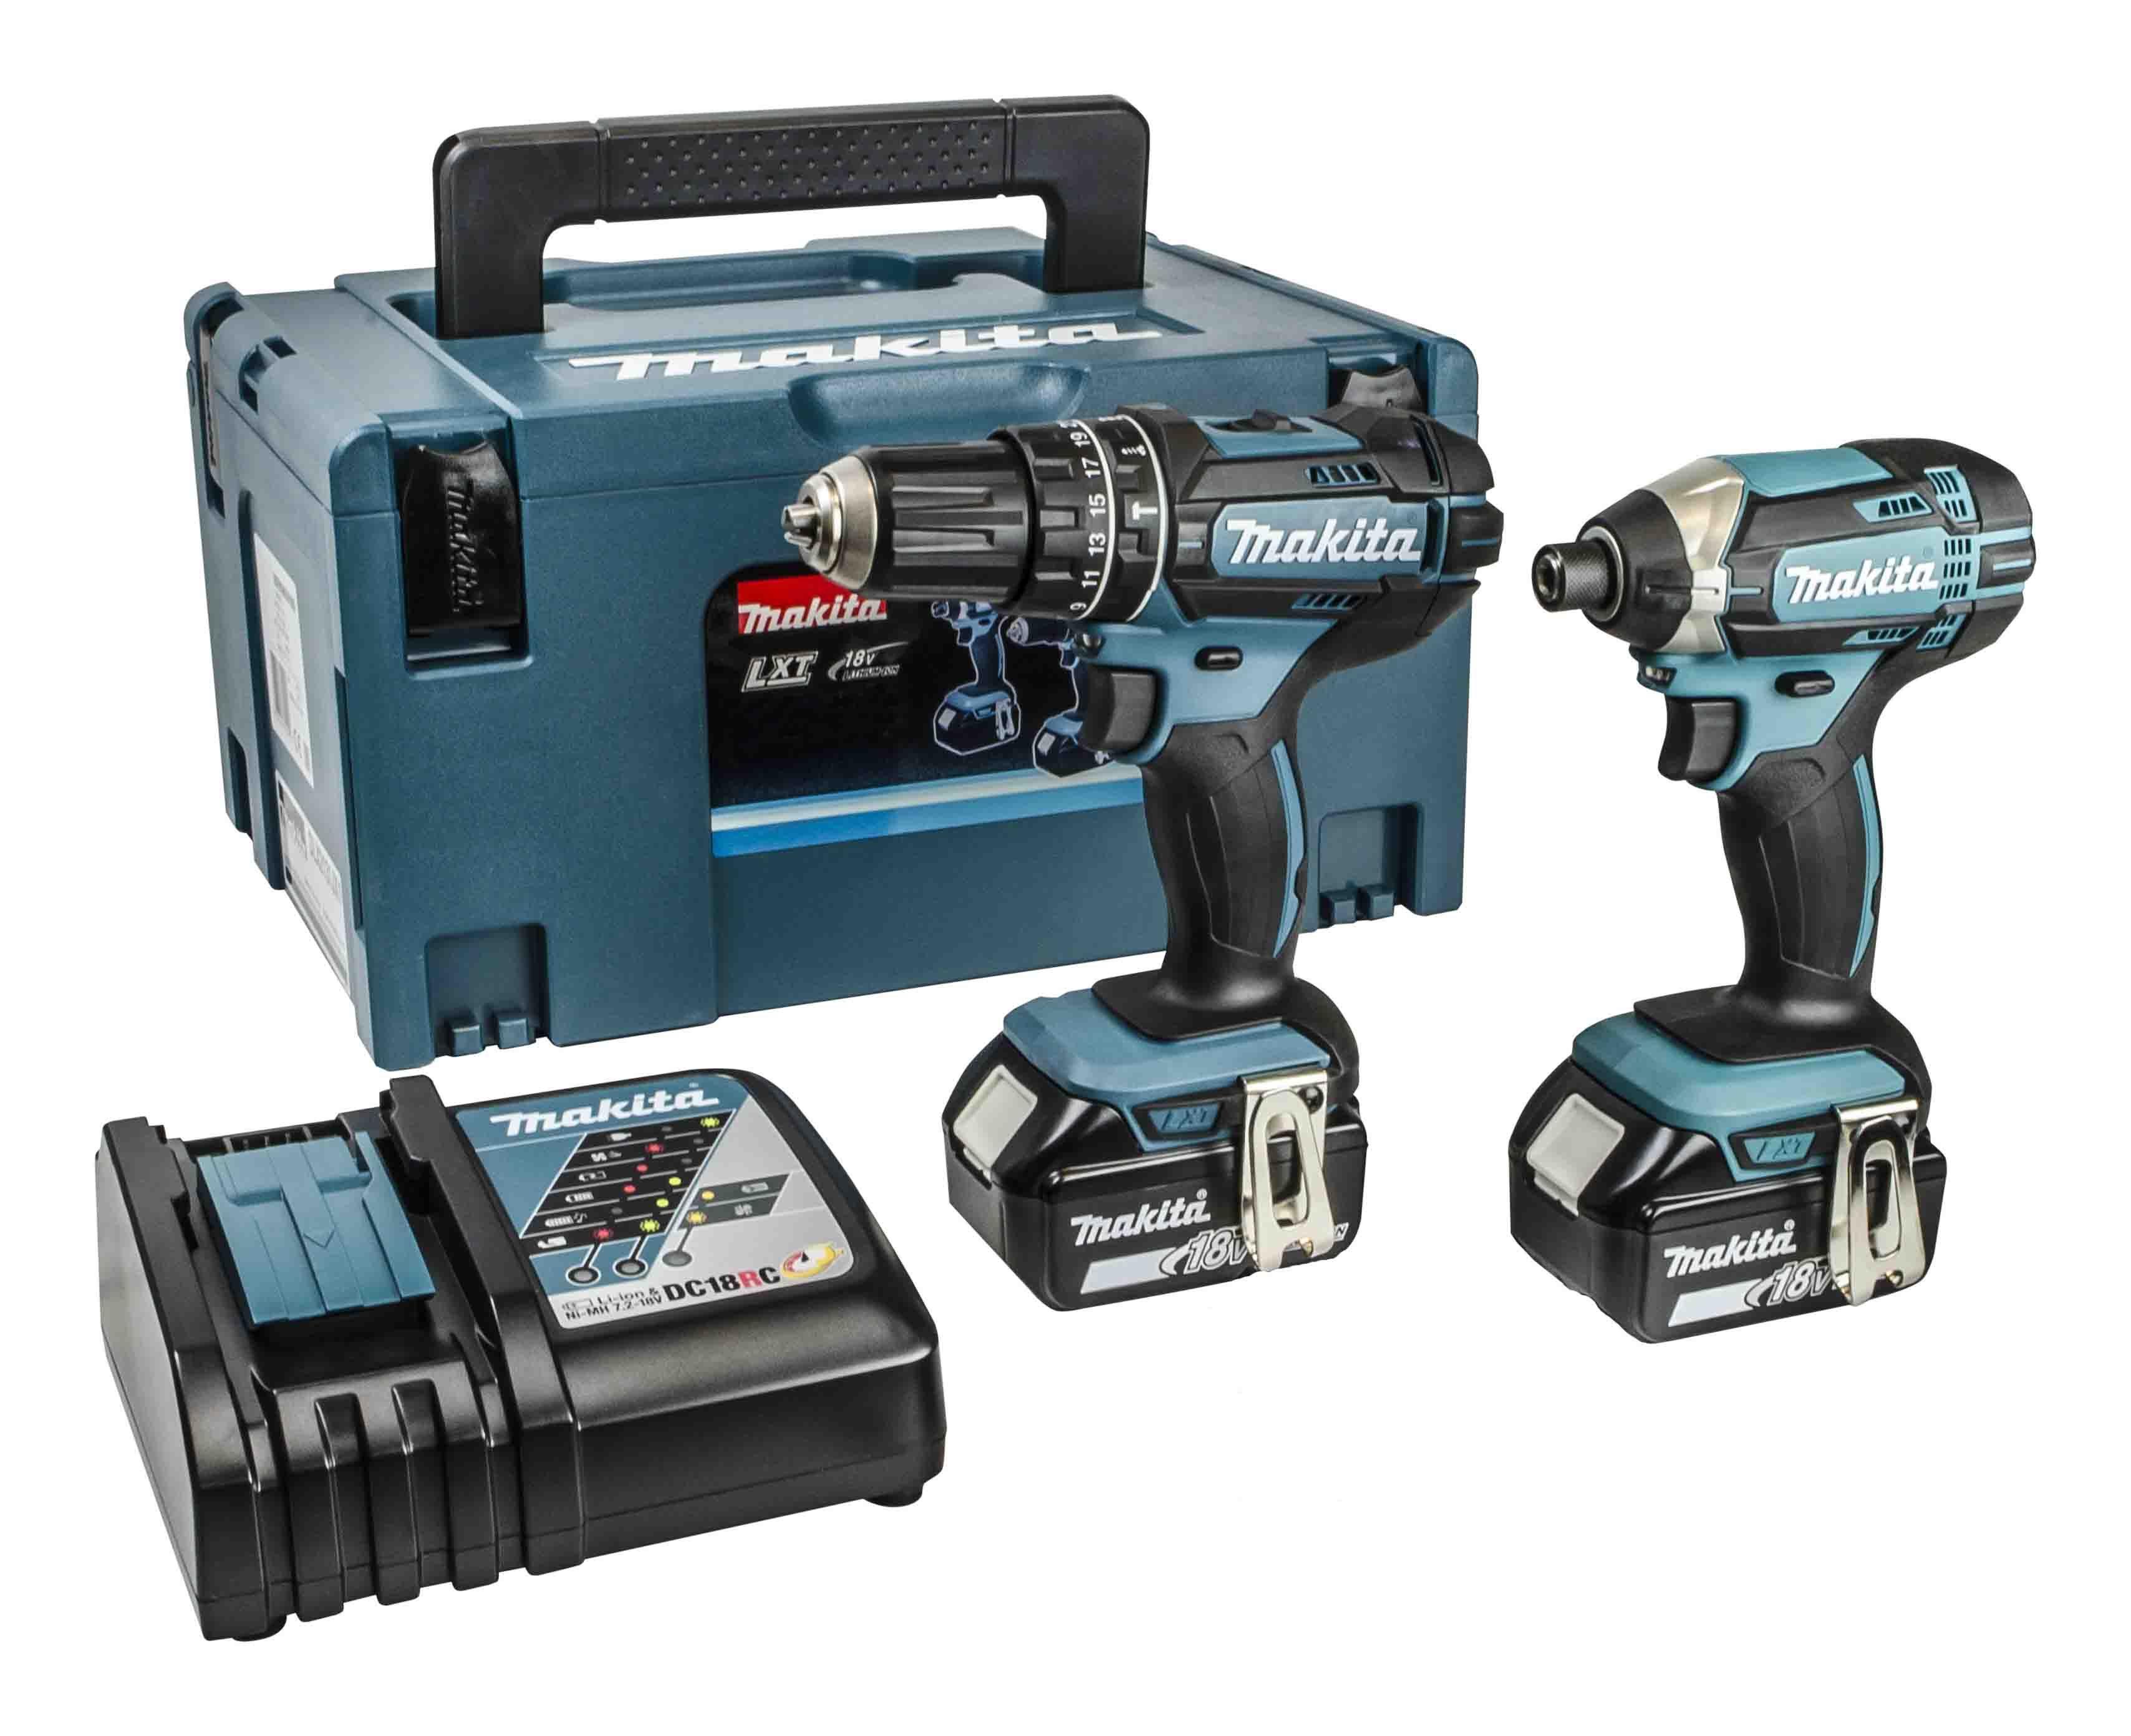 Makita DLX2131TJ 18v Twin Pack Combi Drill & Impact Driver 2x 5Ah